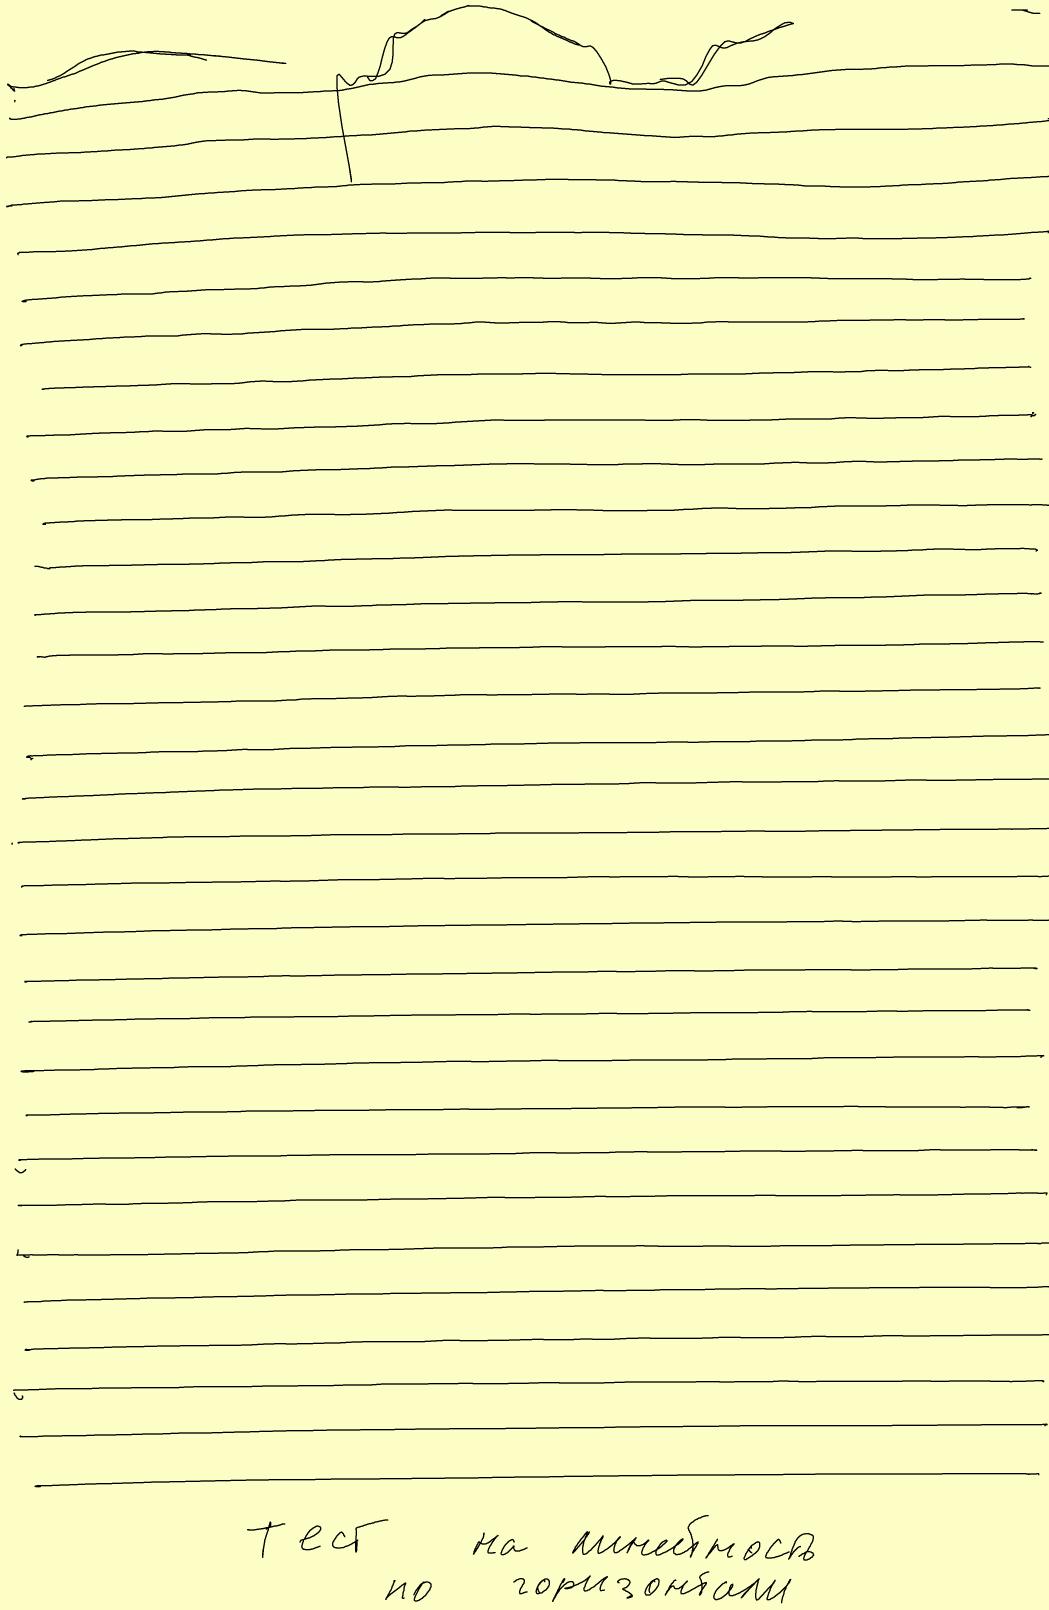 Тест-драйв цифровой ручки Даджет МТ6080 - 14